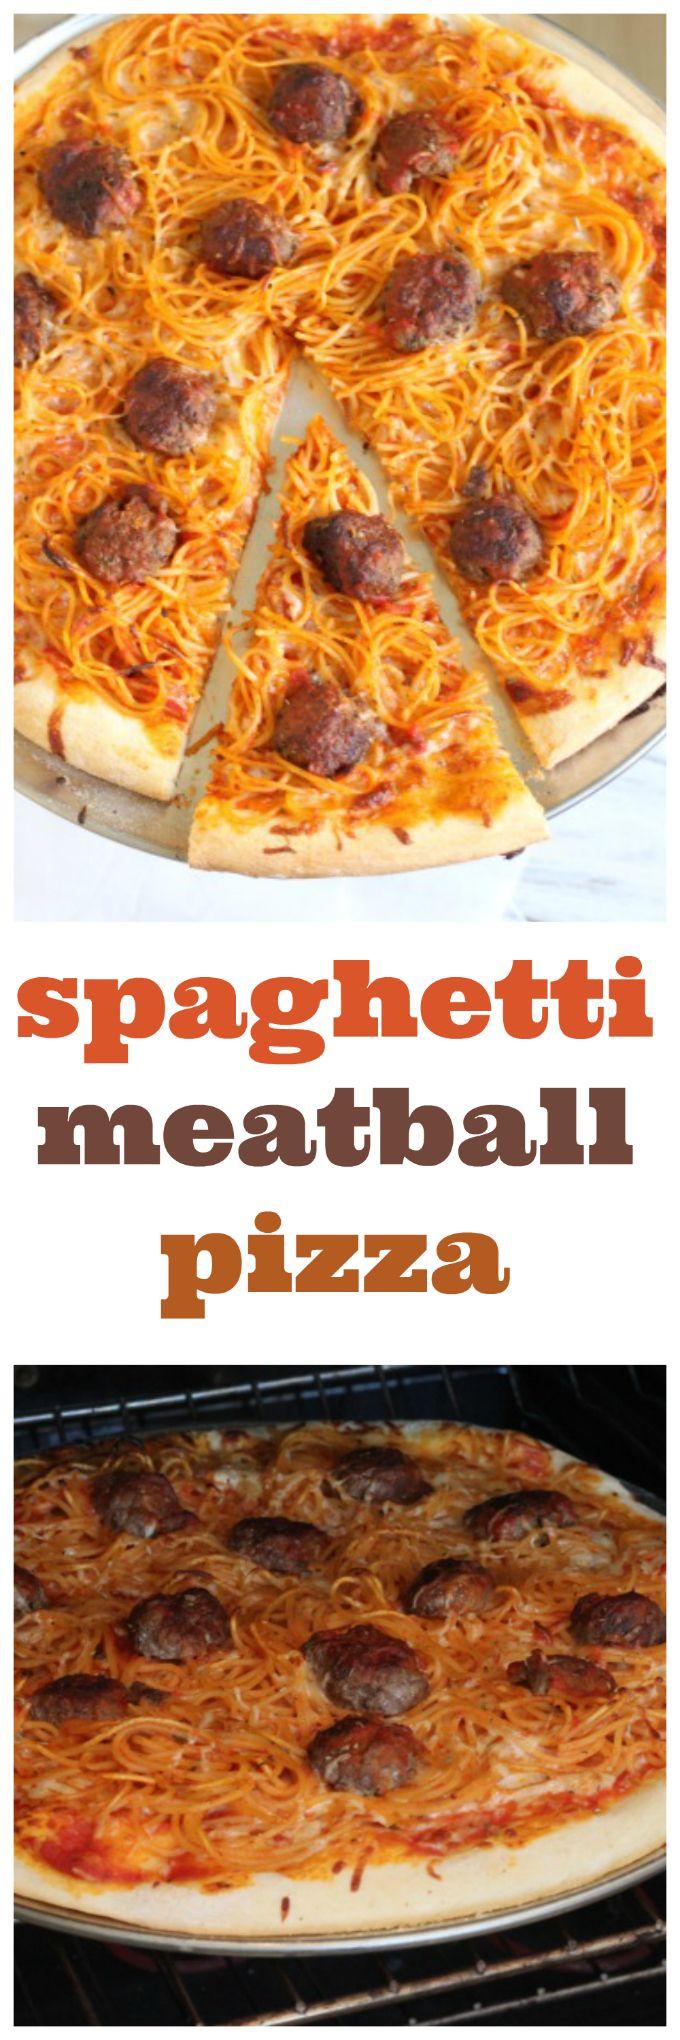 spaghetti and meatball pizza @createdbydiane